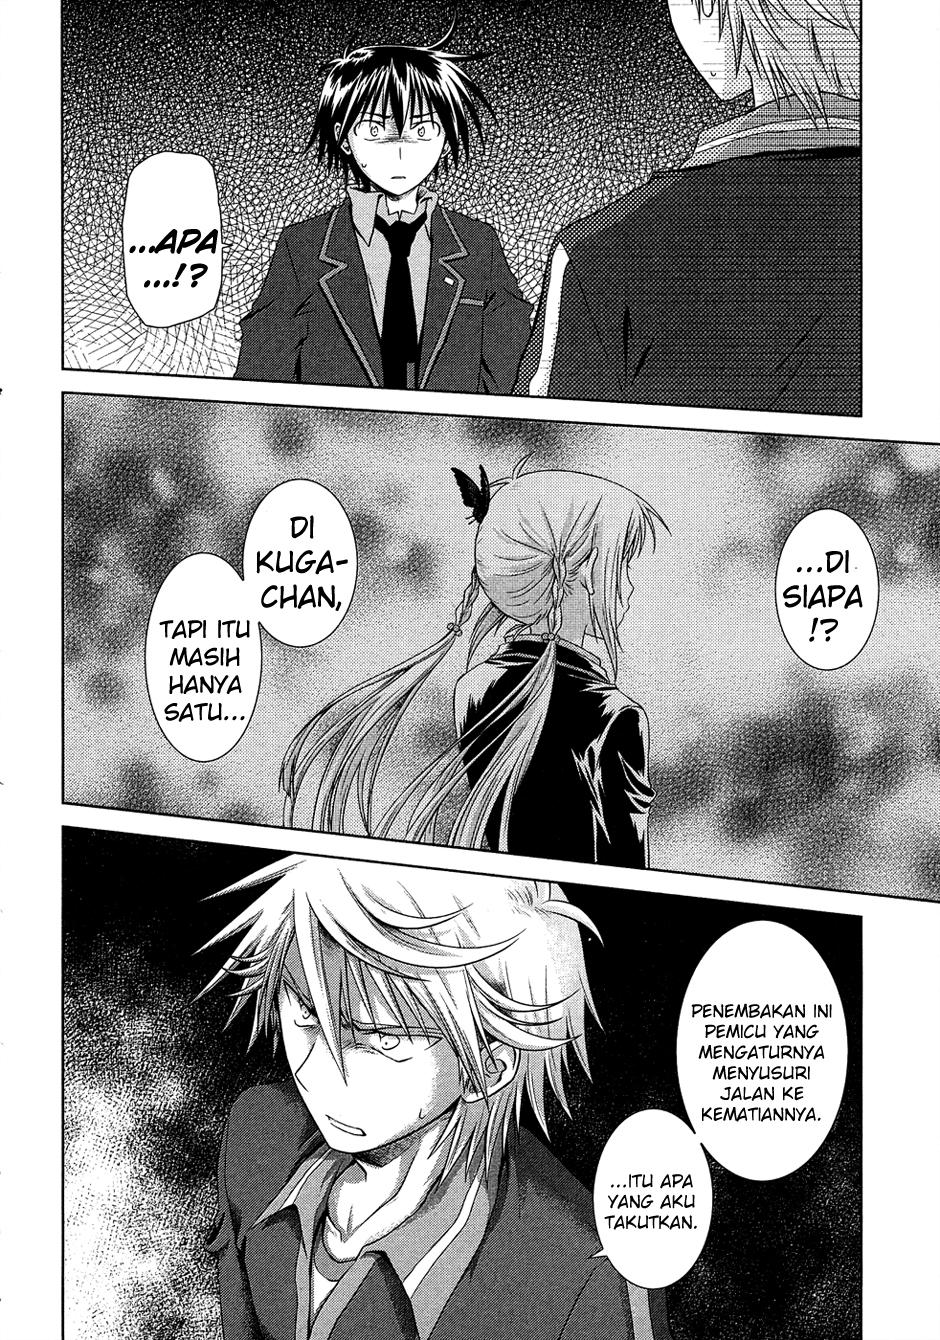 Komik iris zero 0010 11 Indonesia iris zero 0010 Terbaru 13|Baca Manga Komik Indonesia|